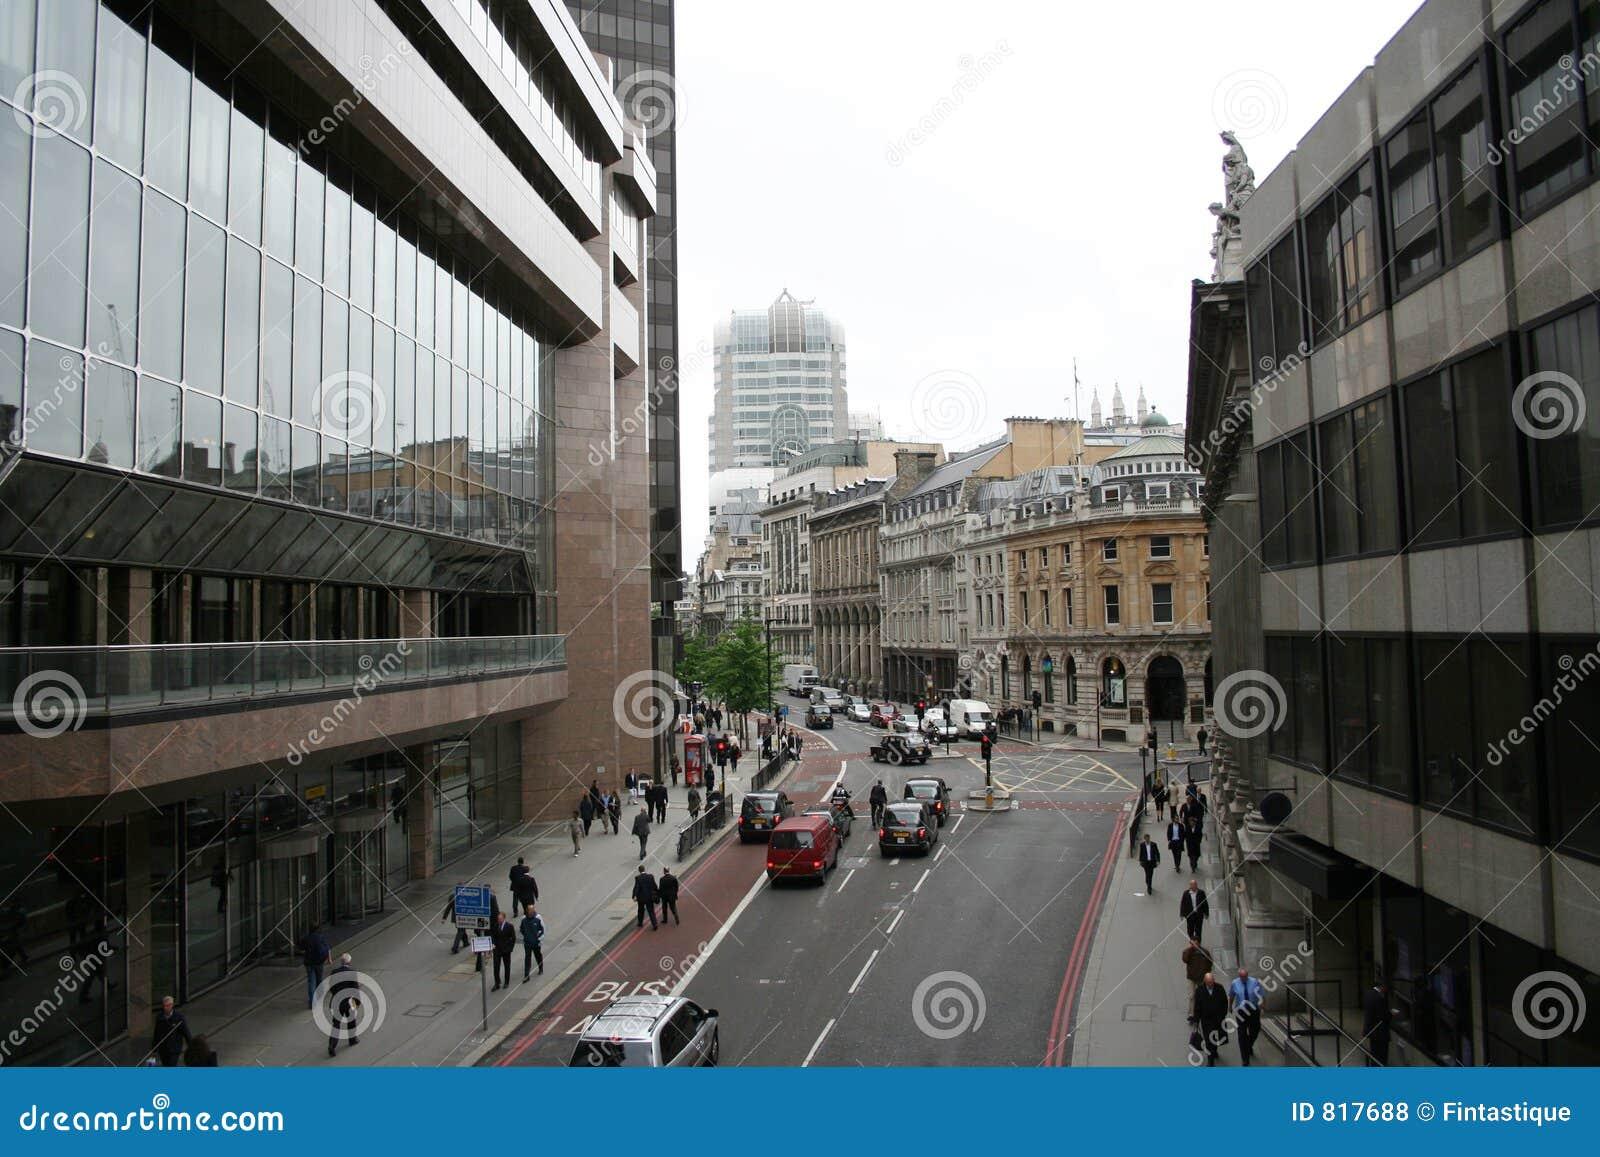 London City Street Royalty Free Stock Photos Image 817688